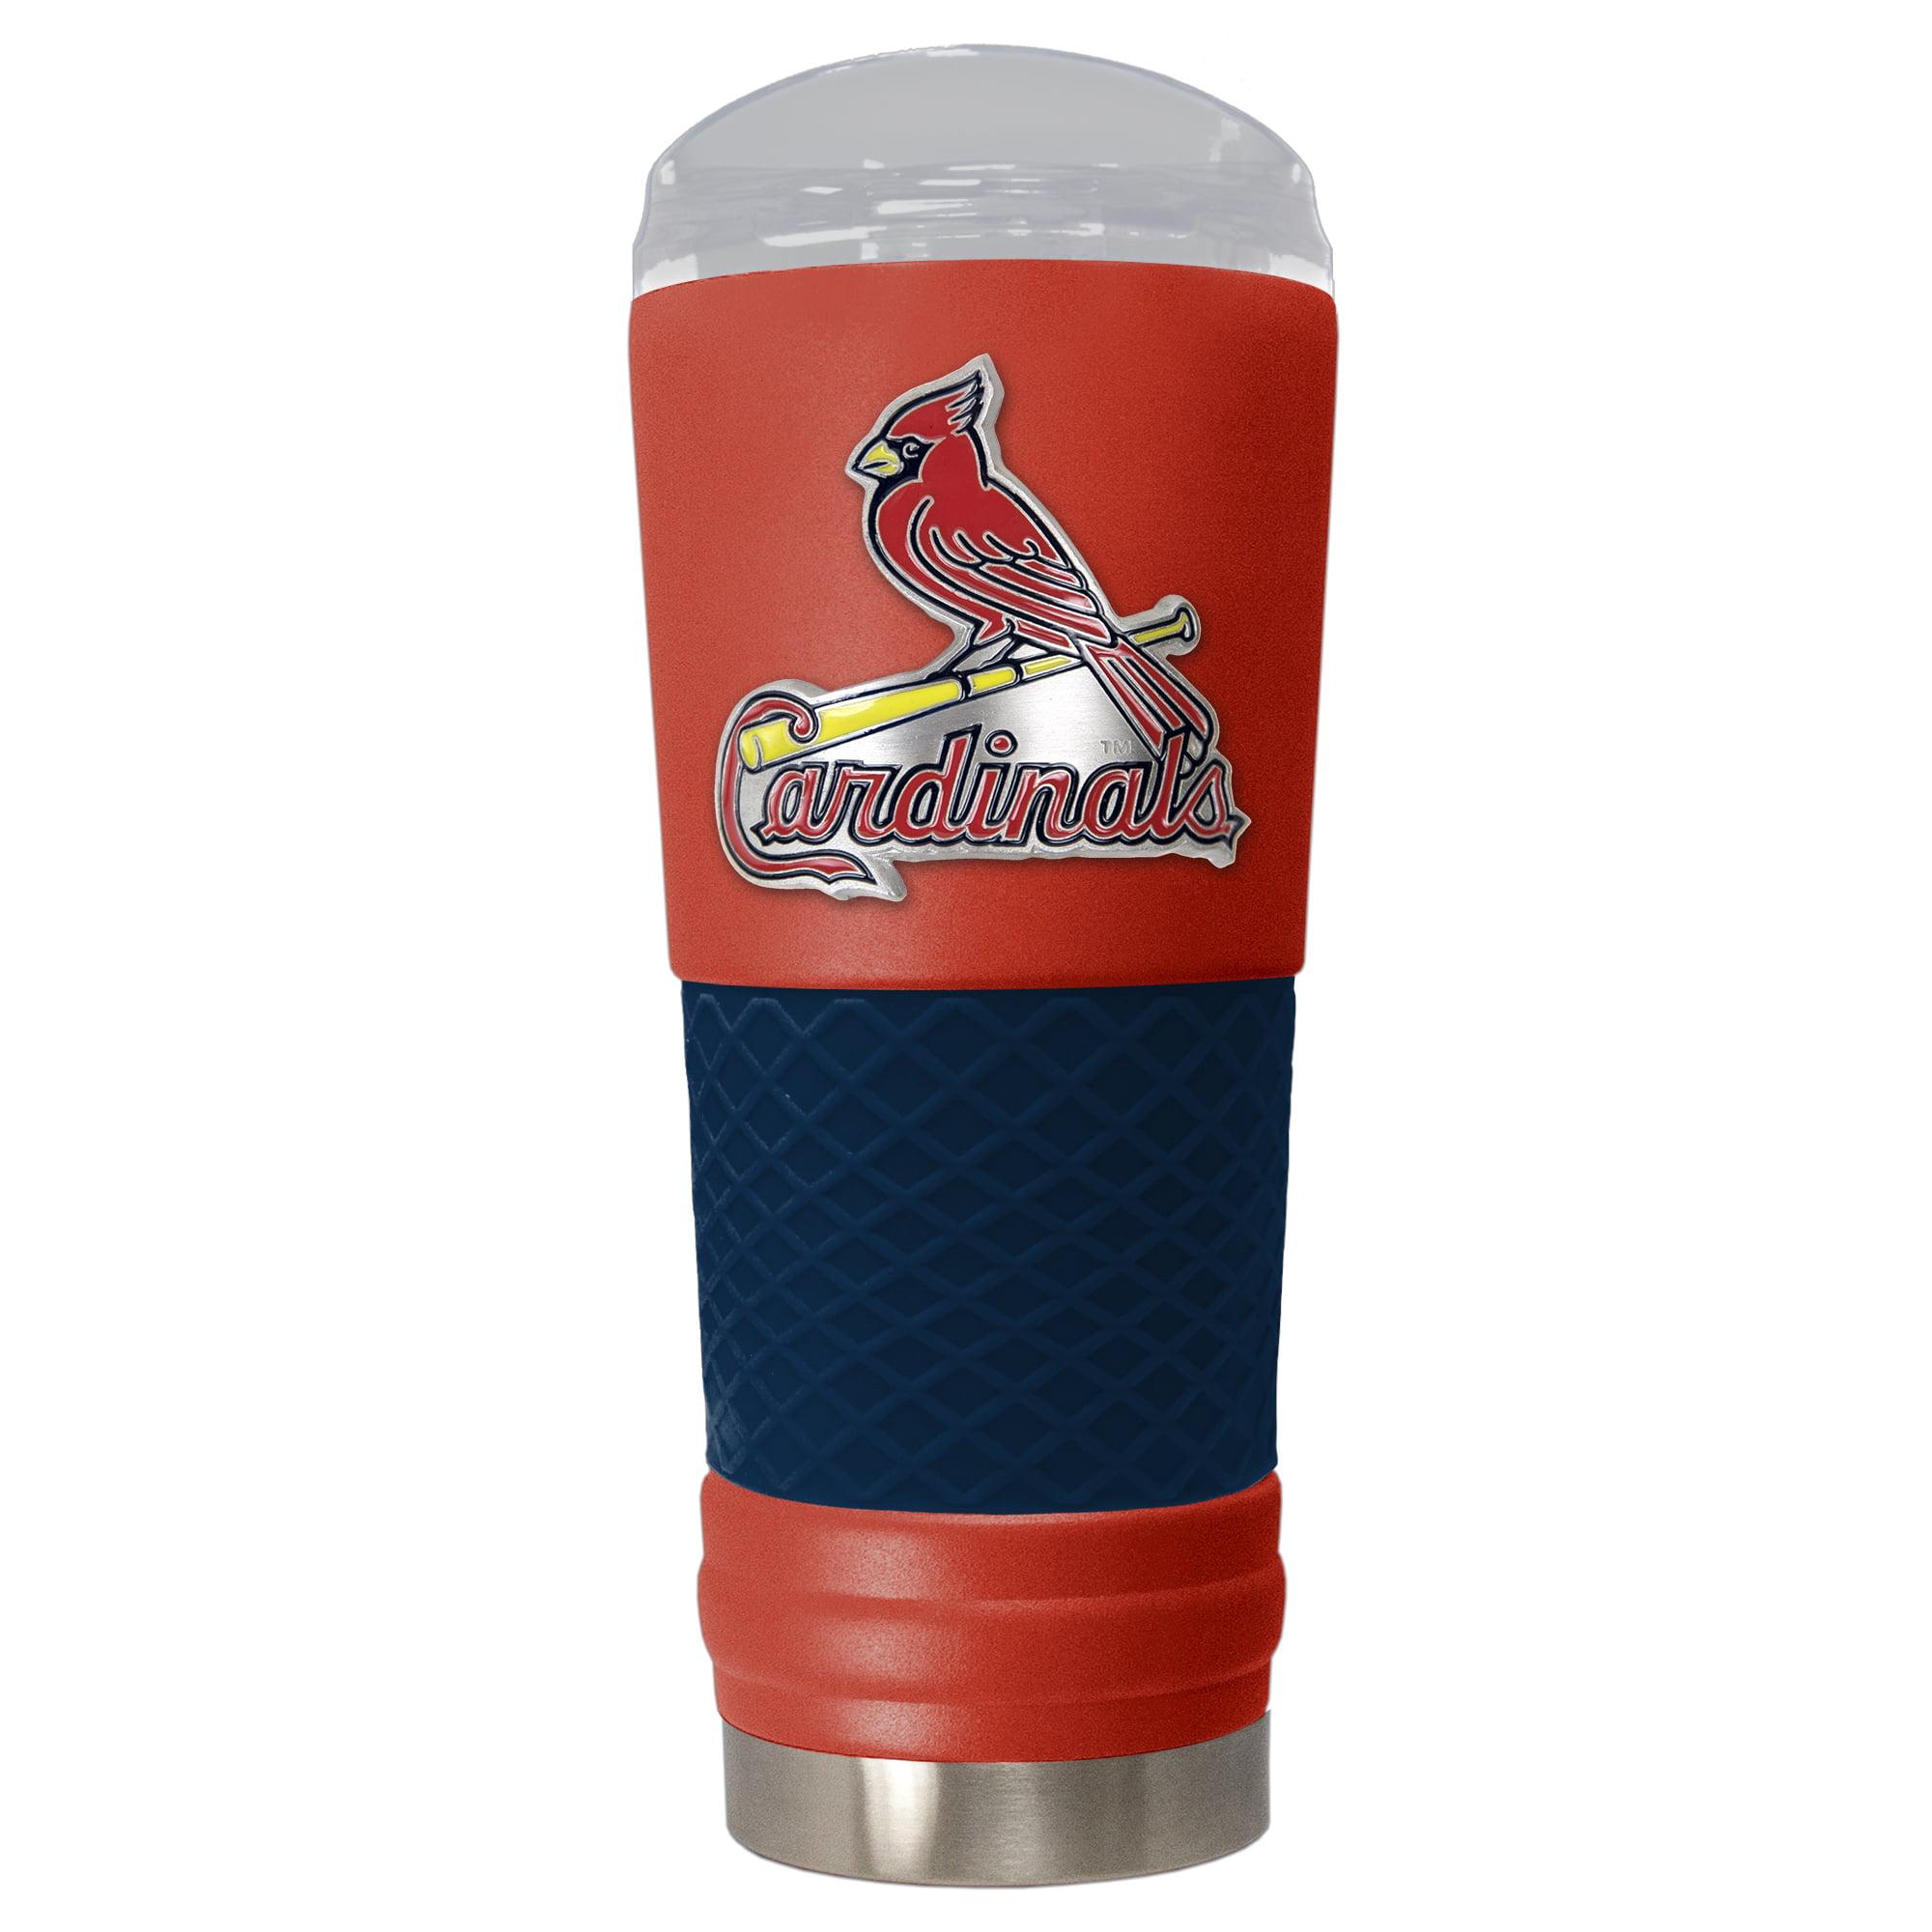 St. Louis Cardinals 24oz. Powder Coated Draft Travel Mug - Red - No Size